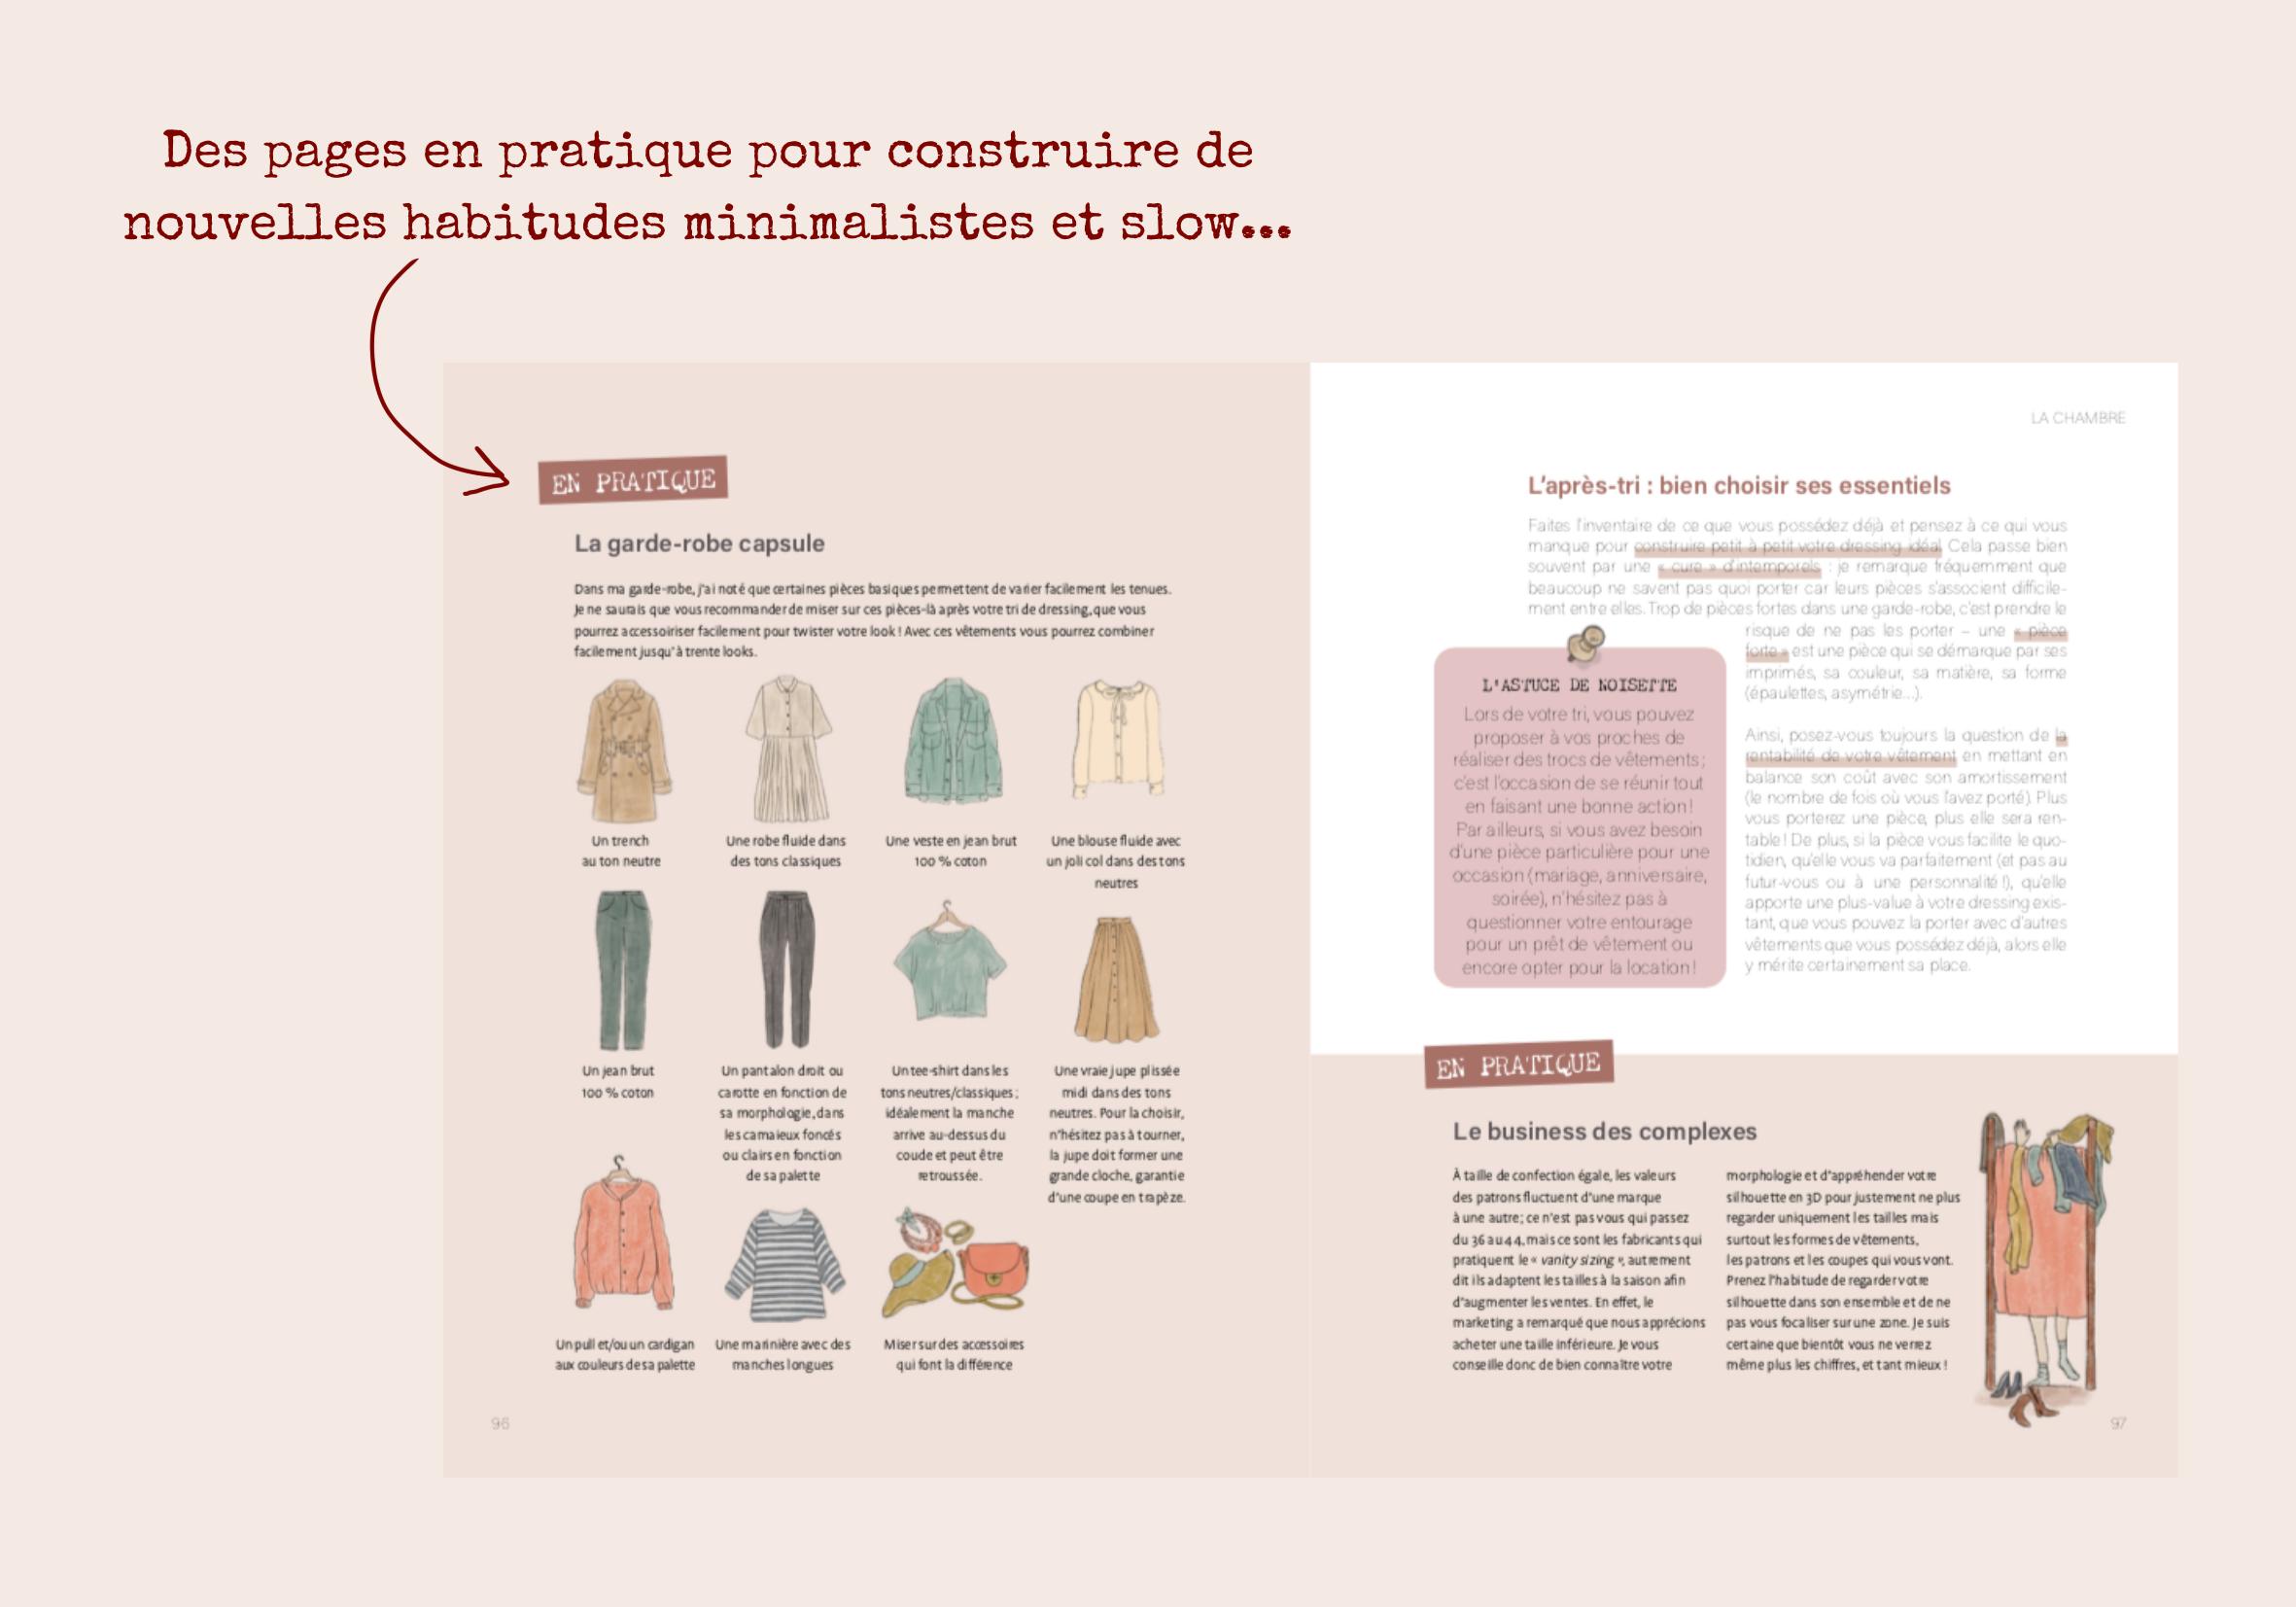 livre-dressing-mode-responsable-ethique